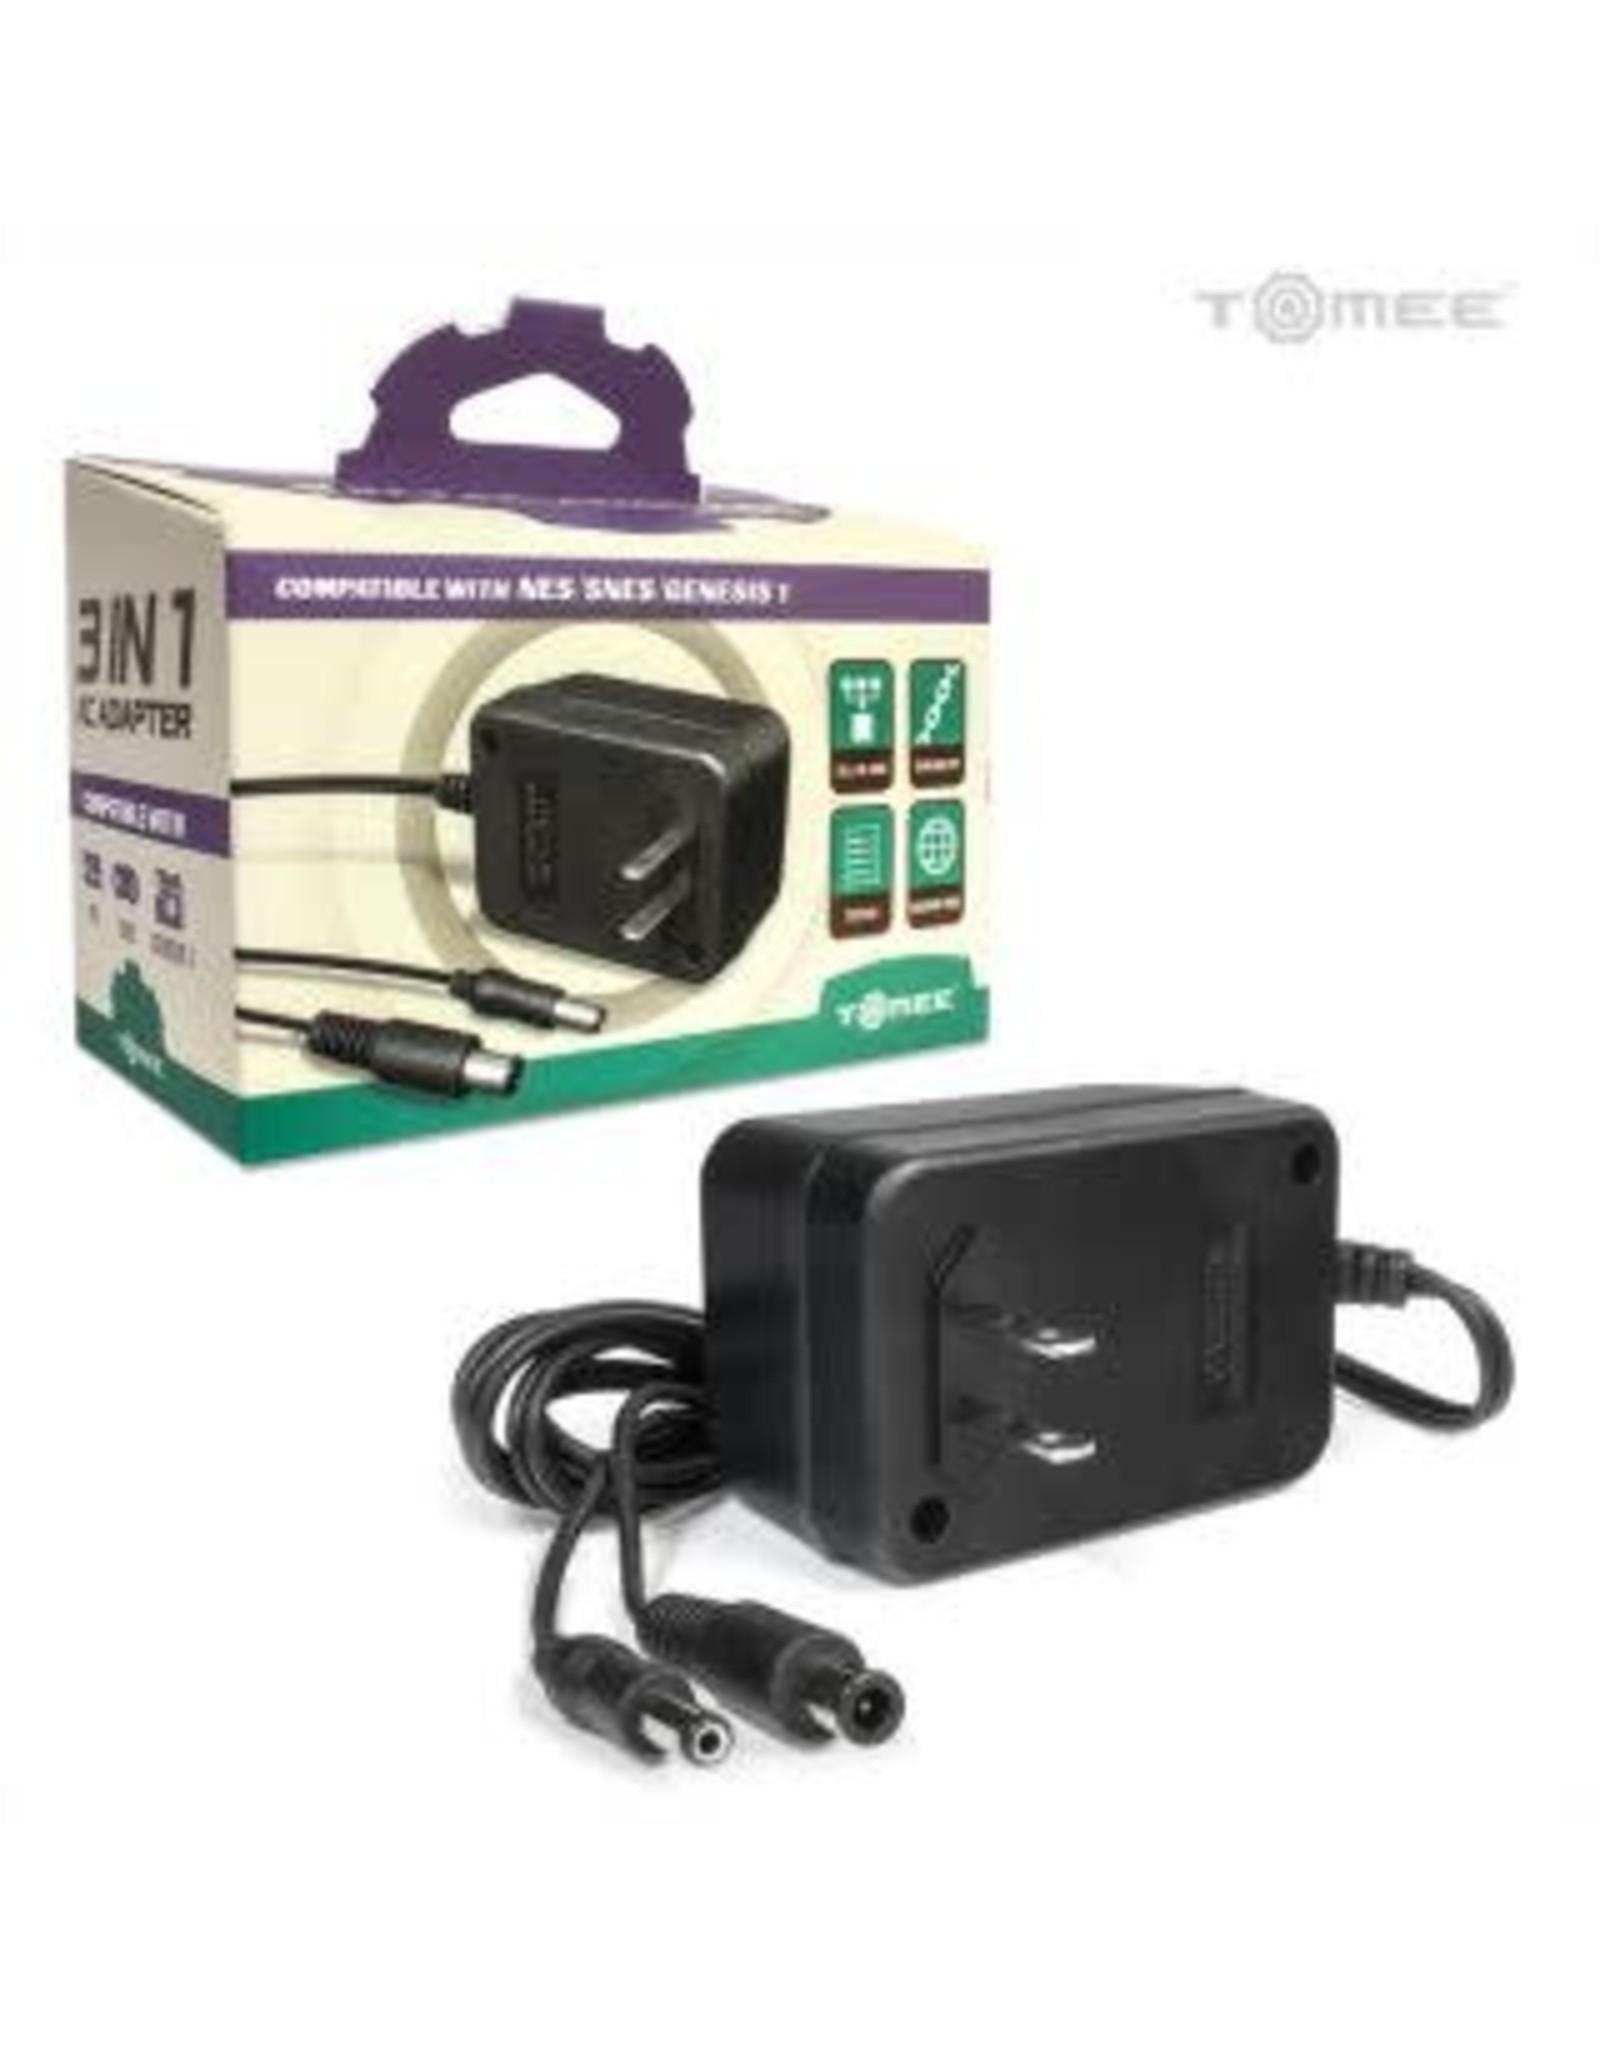 3 in 1 Universal AC Adapter for Super NES / NES / Genesis